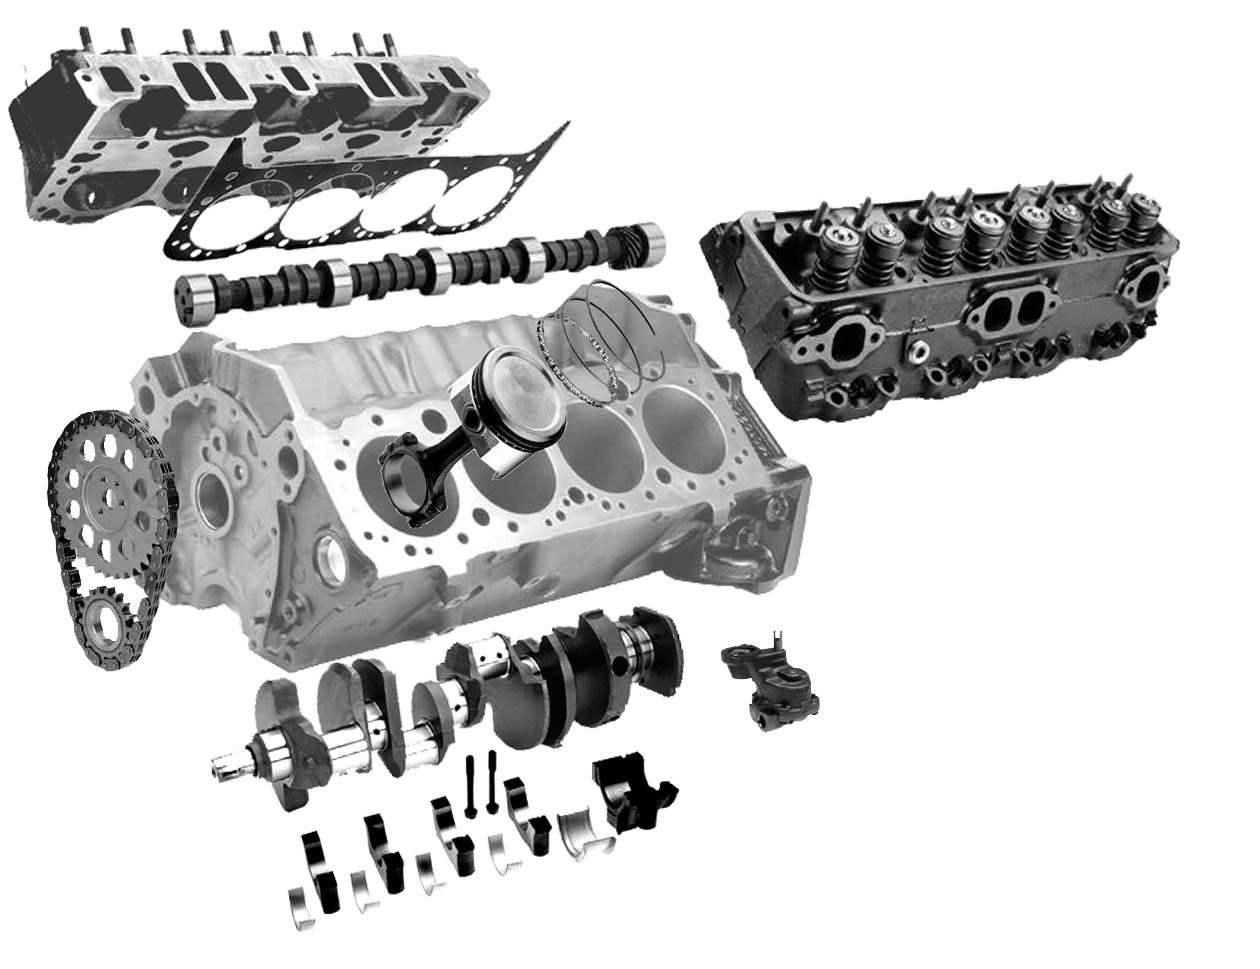 http://www.ballinderryengineering.co.uk/images/Editable%20Images/Spare_parts_for_Marine_Diesel_Engine__Air_Compressor__Turbocharger__etc.jpg